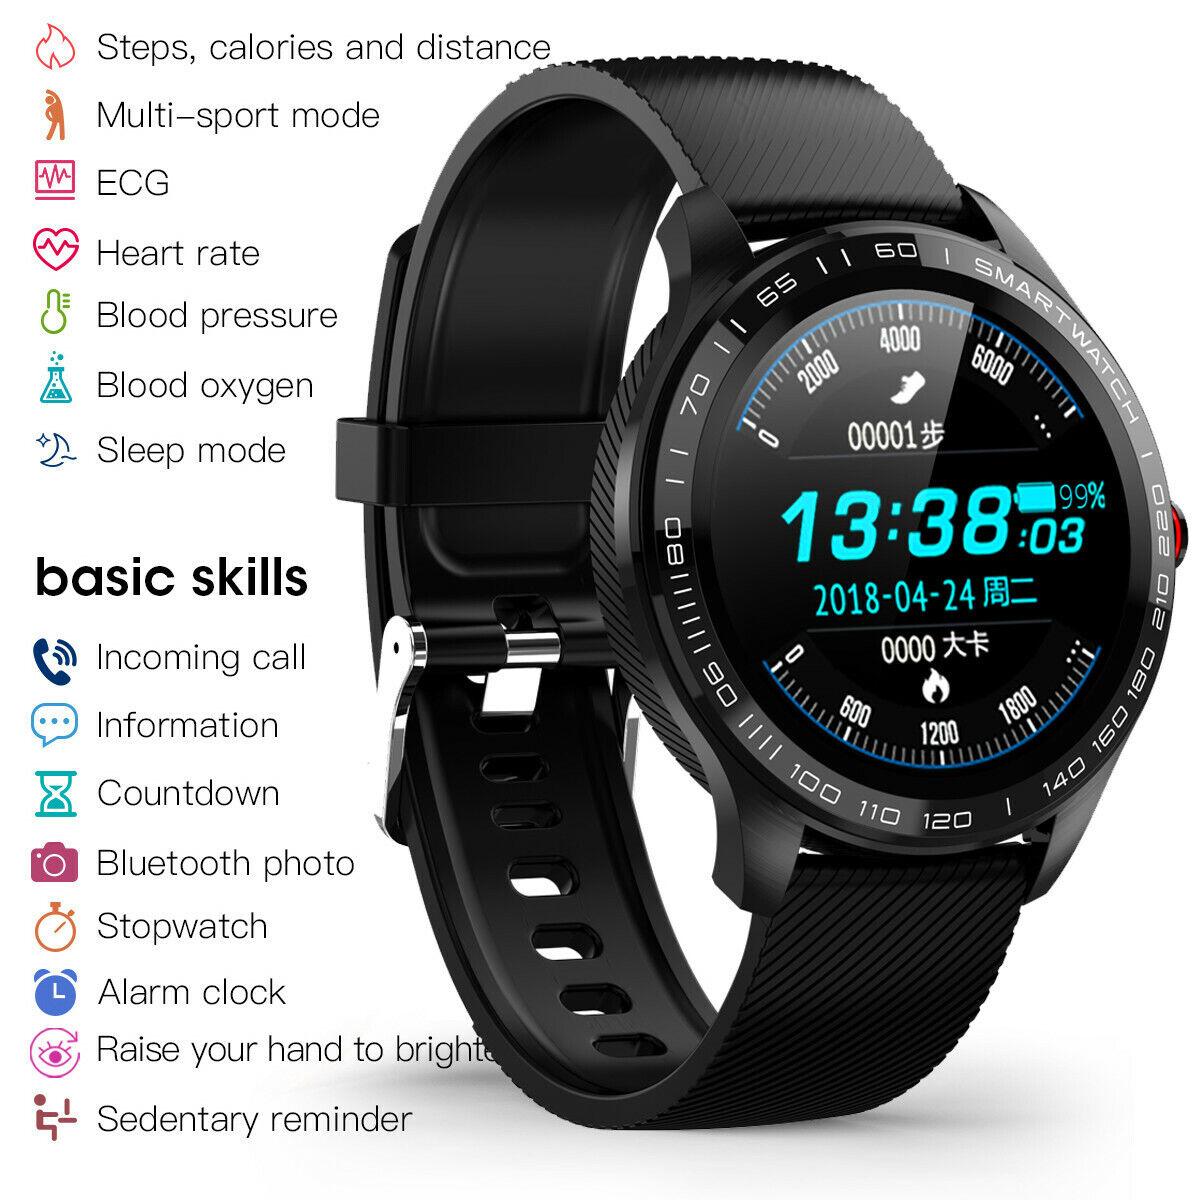 ECG PPG Smart Watch Men Heart Rate Monitor Bluetooth Smartwatch Waterproof Band bluetooth ecg Featured heart men monitor ppg rate smart smartwatch watch